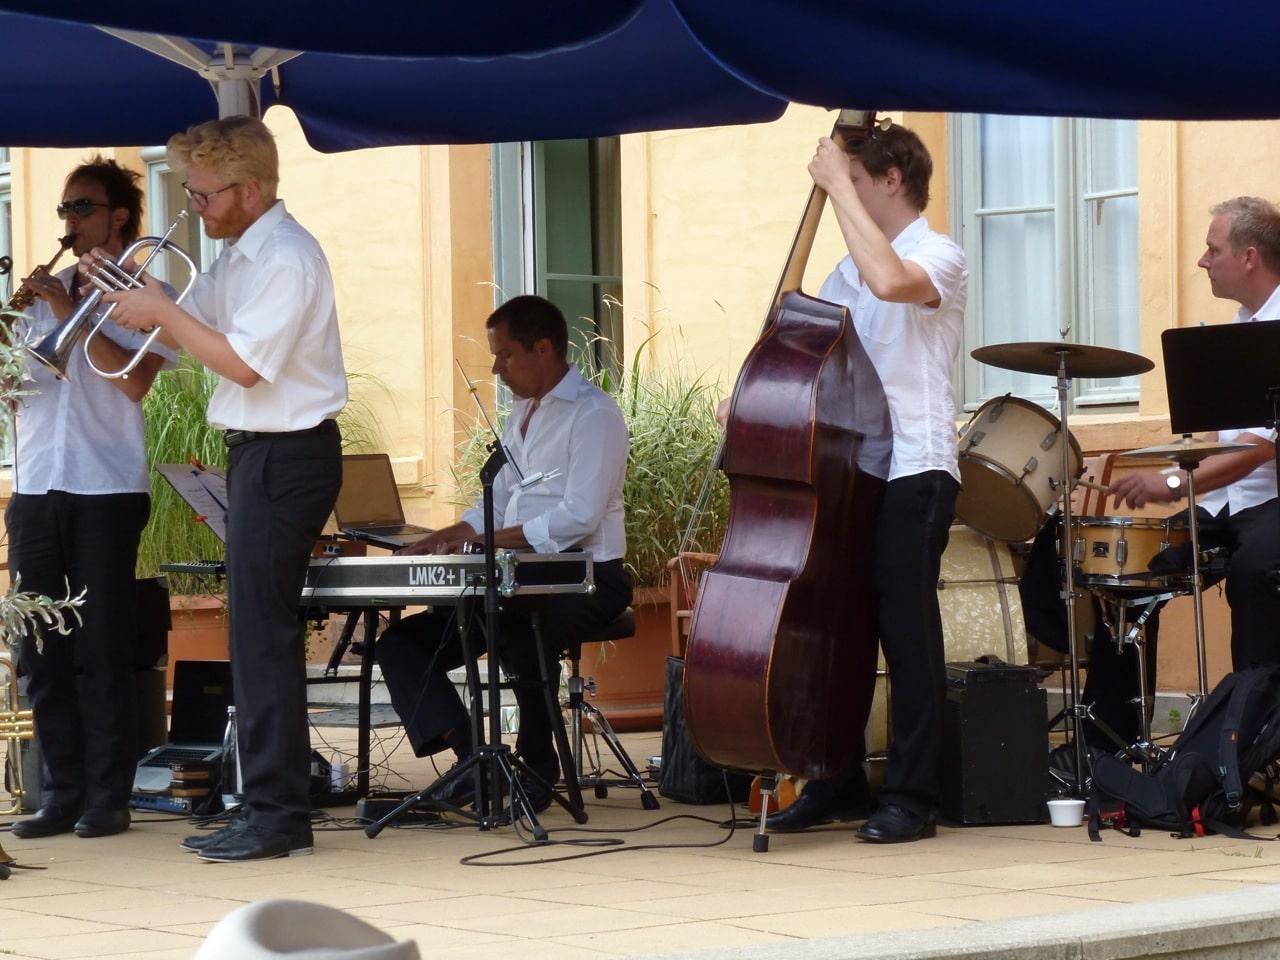 jazz band berlin swing band berlin jazz trio berlin. Black Bedroom Furniture Sets. Home Design Ideas